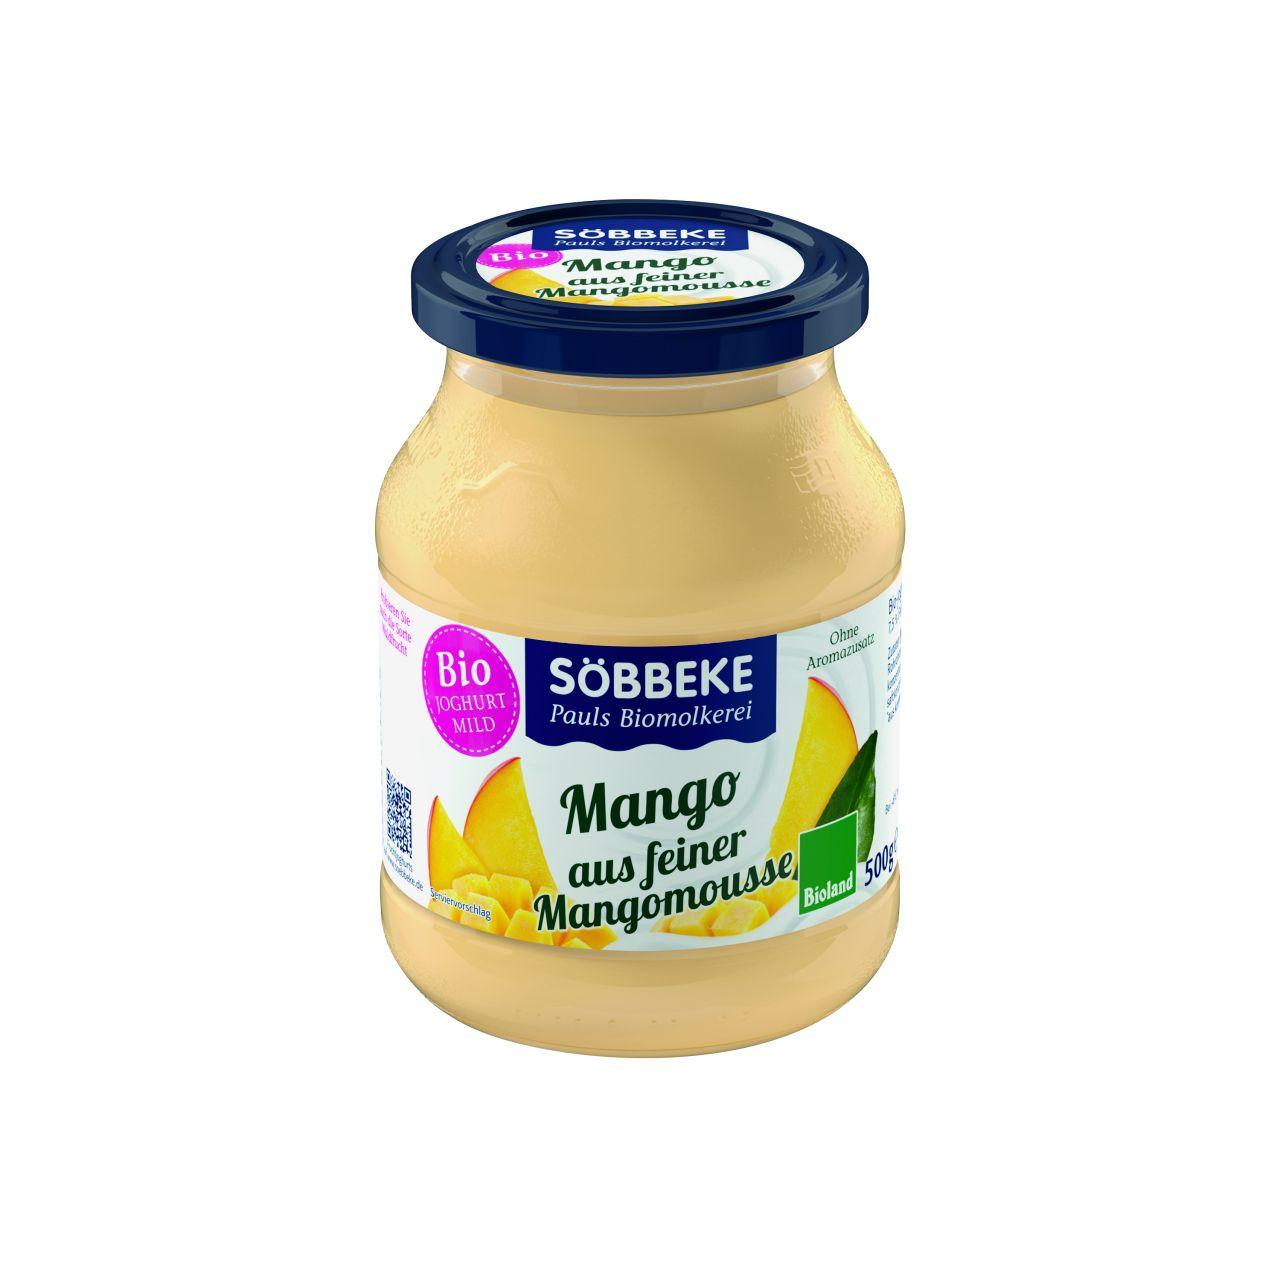 Bio Joghurt mild Mango-Mousse